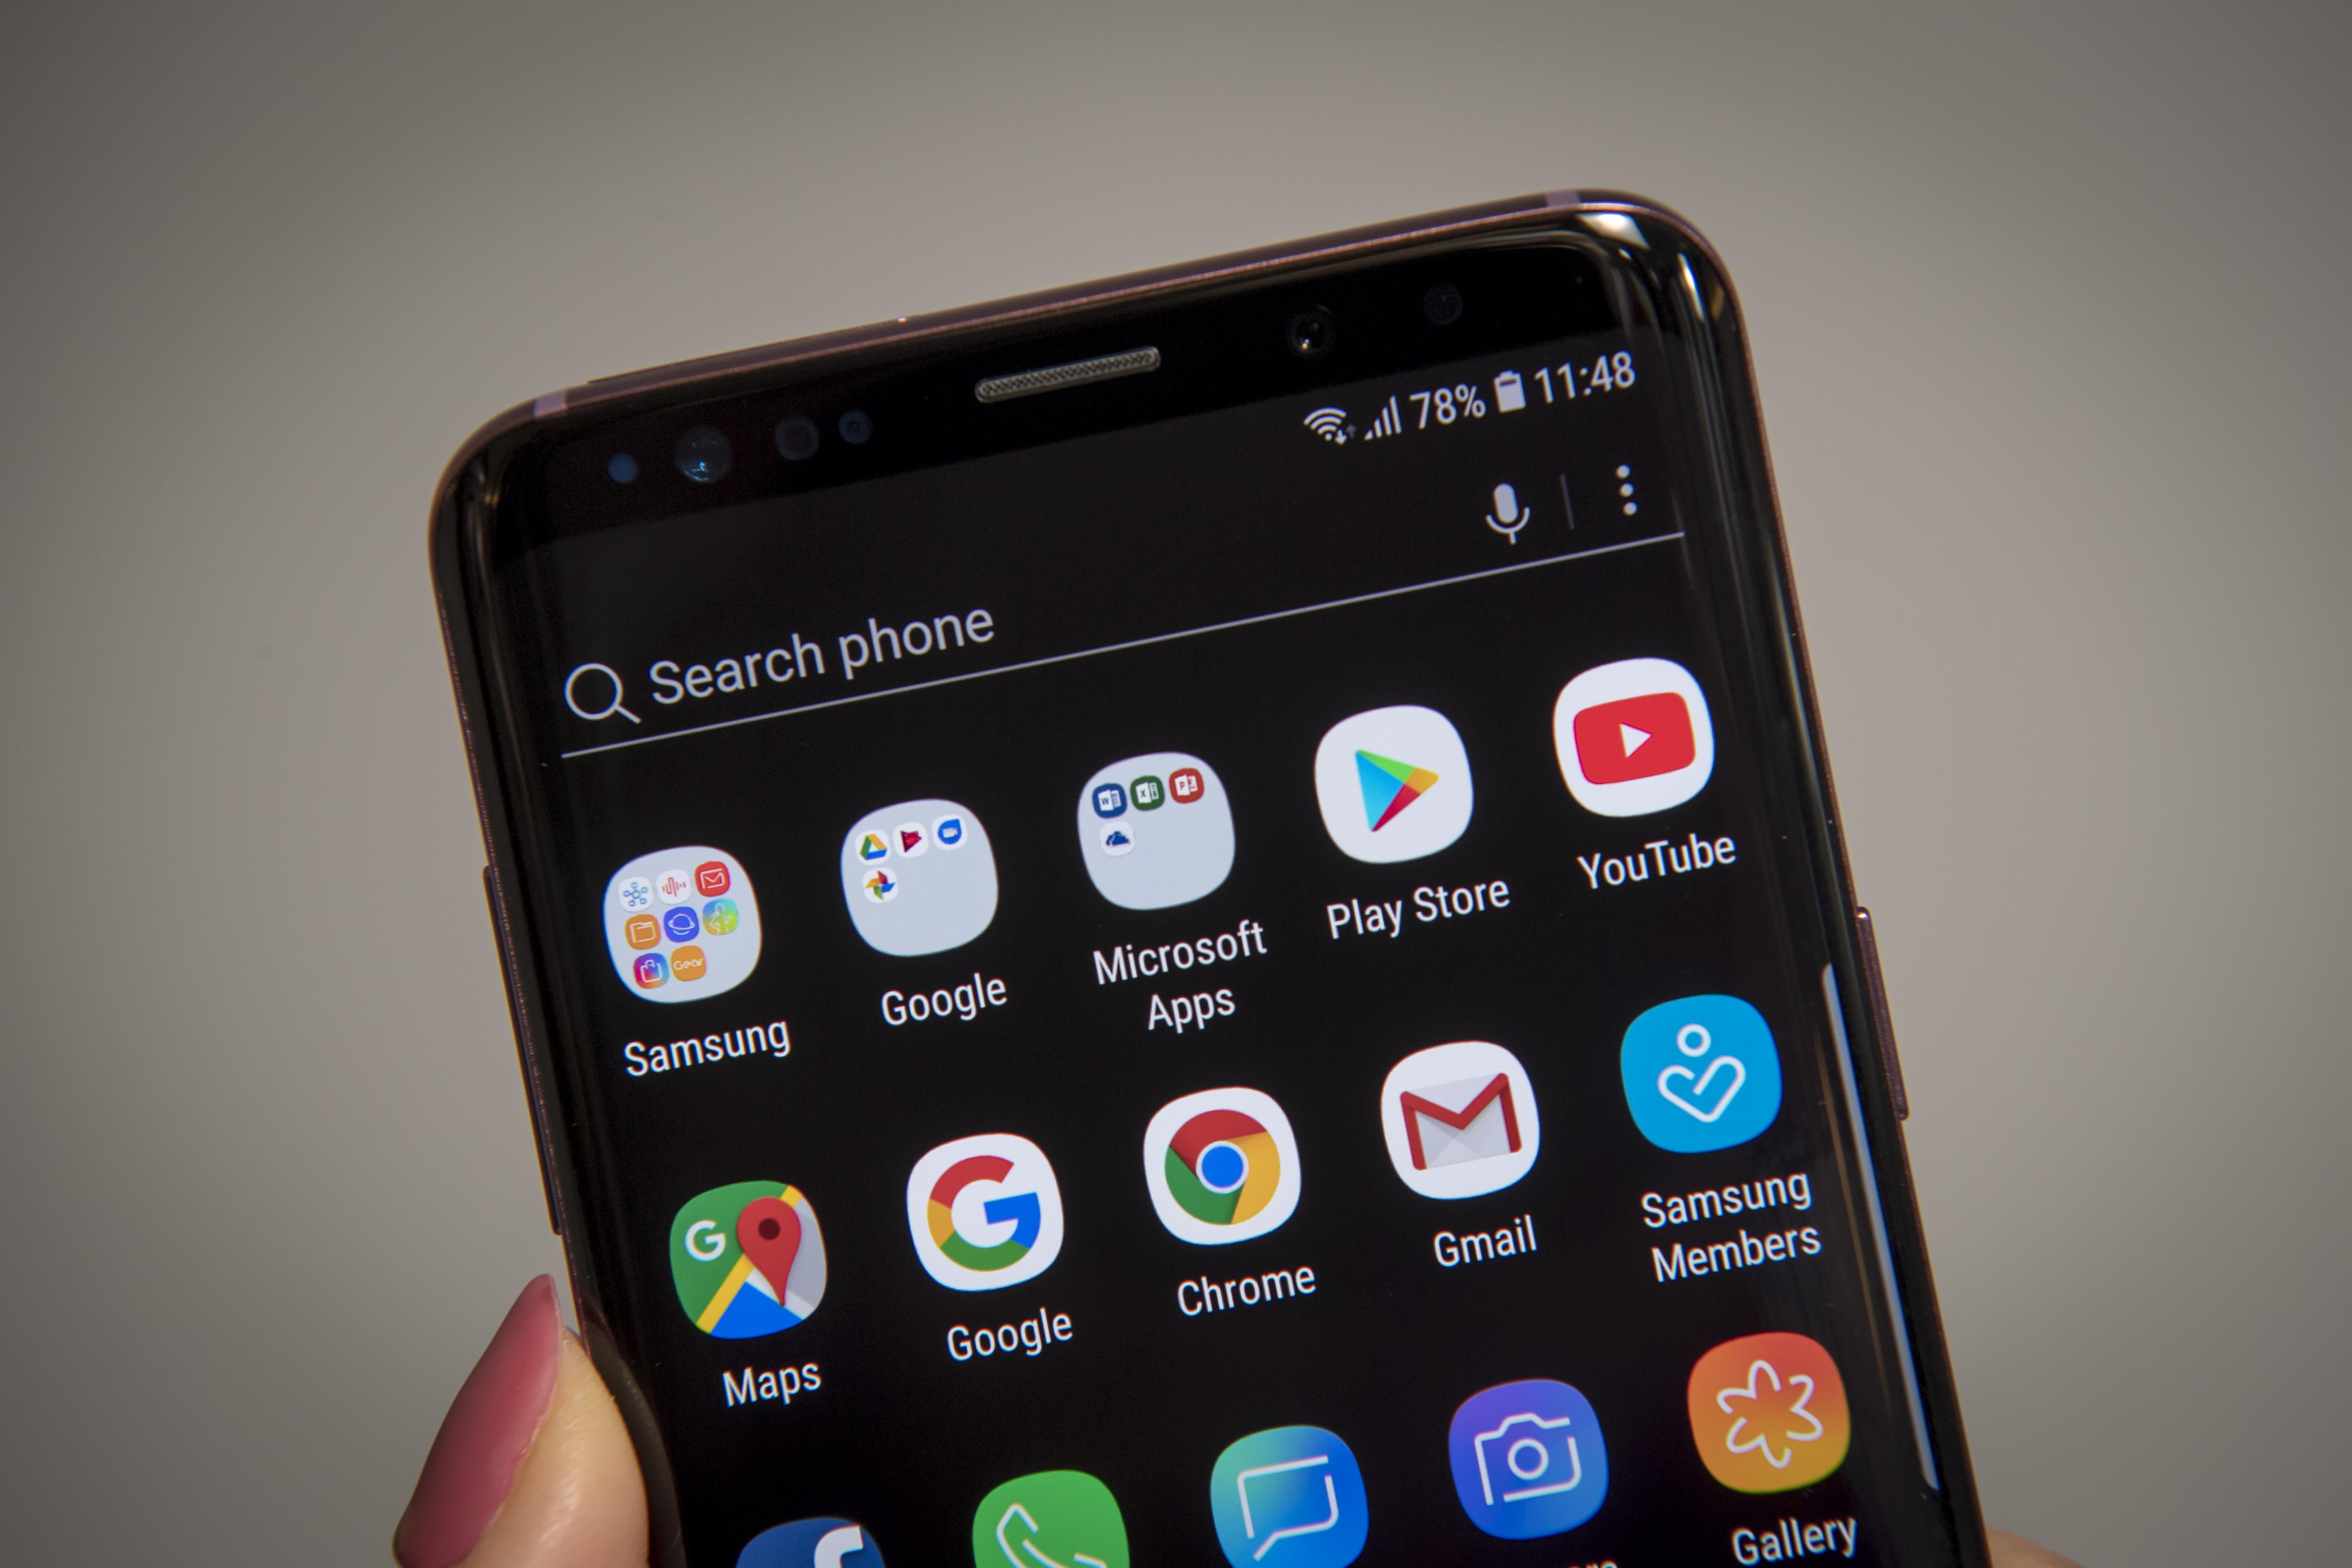 Cara Temukan Aplikasi Tersembunyi di HP Android - Teknologi.id